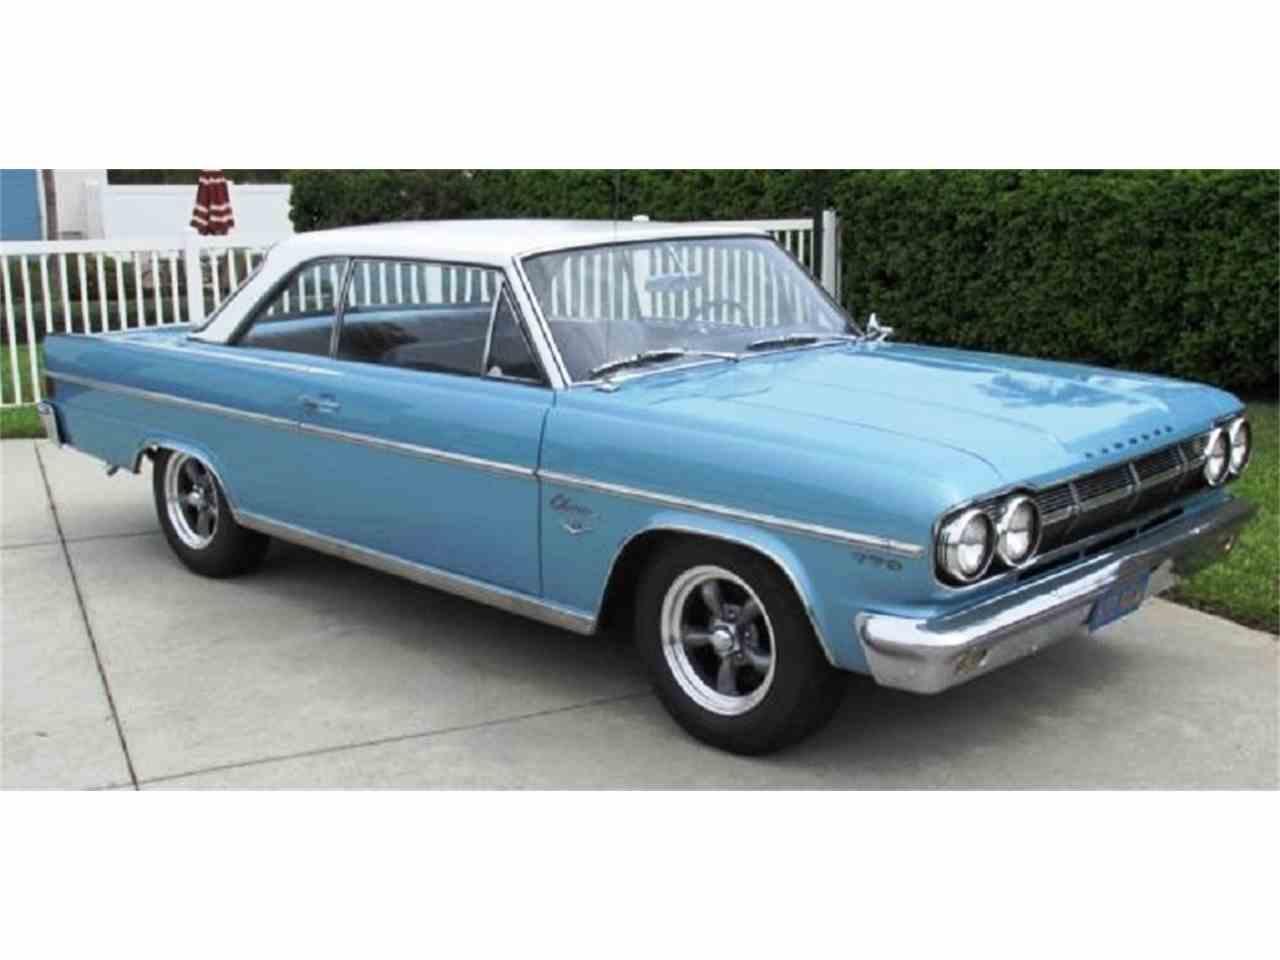 AMC CLASSIC For Sale ClassicCarscom CC - Pompano classic cars